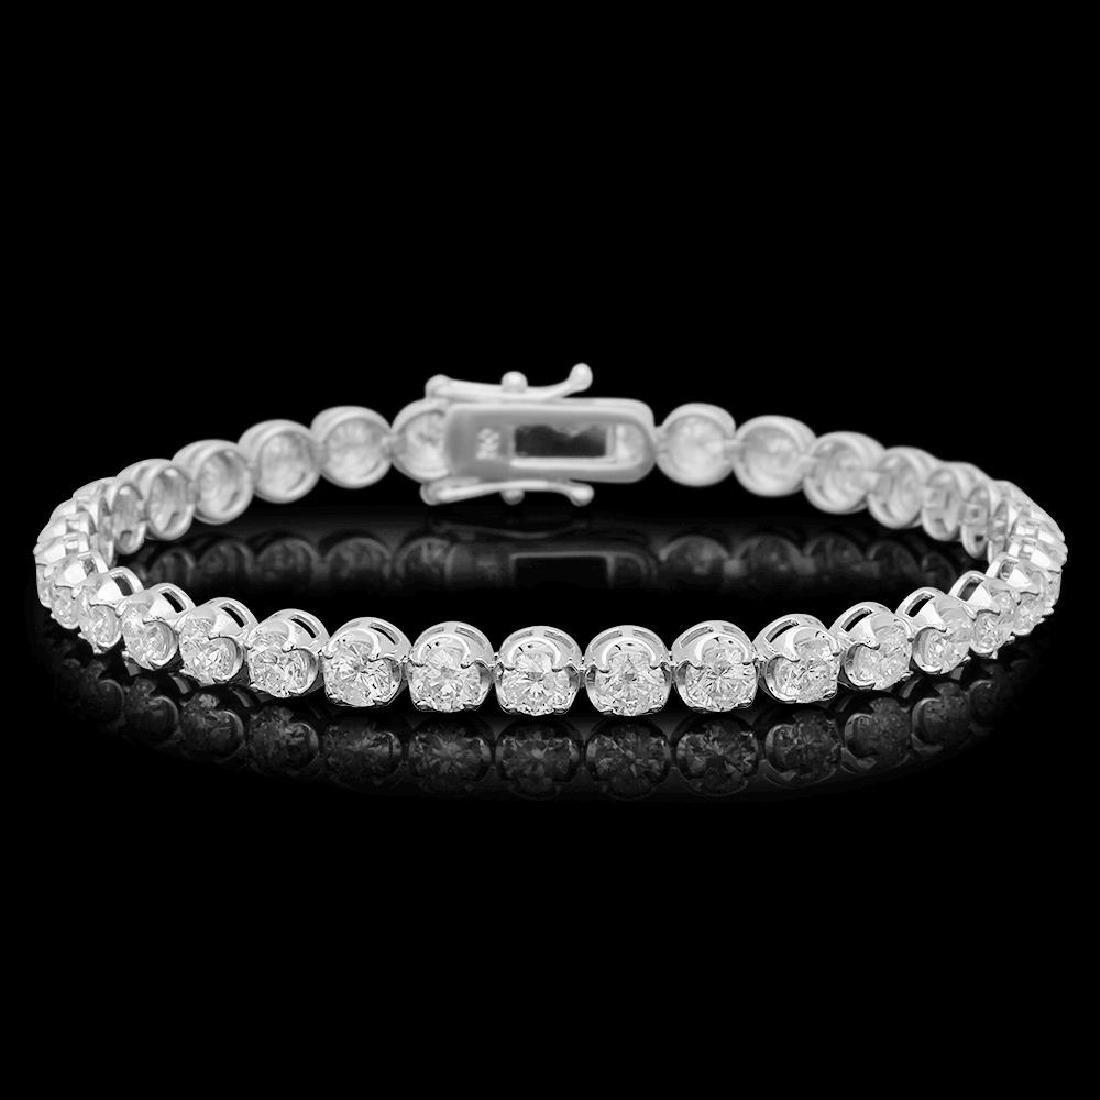 18K Gold 8.67ct Diamond Bracelet